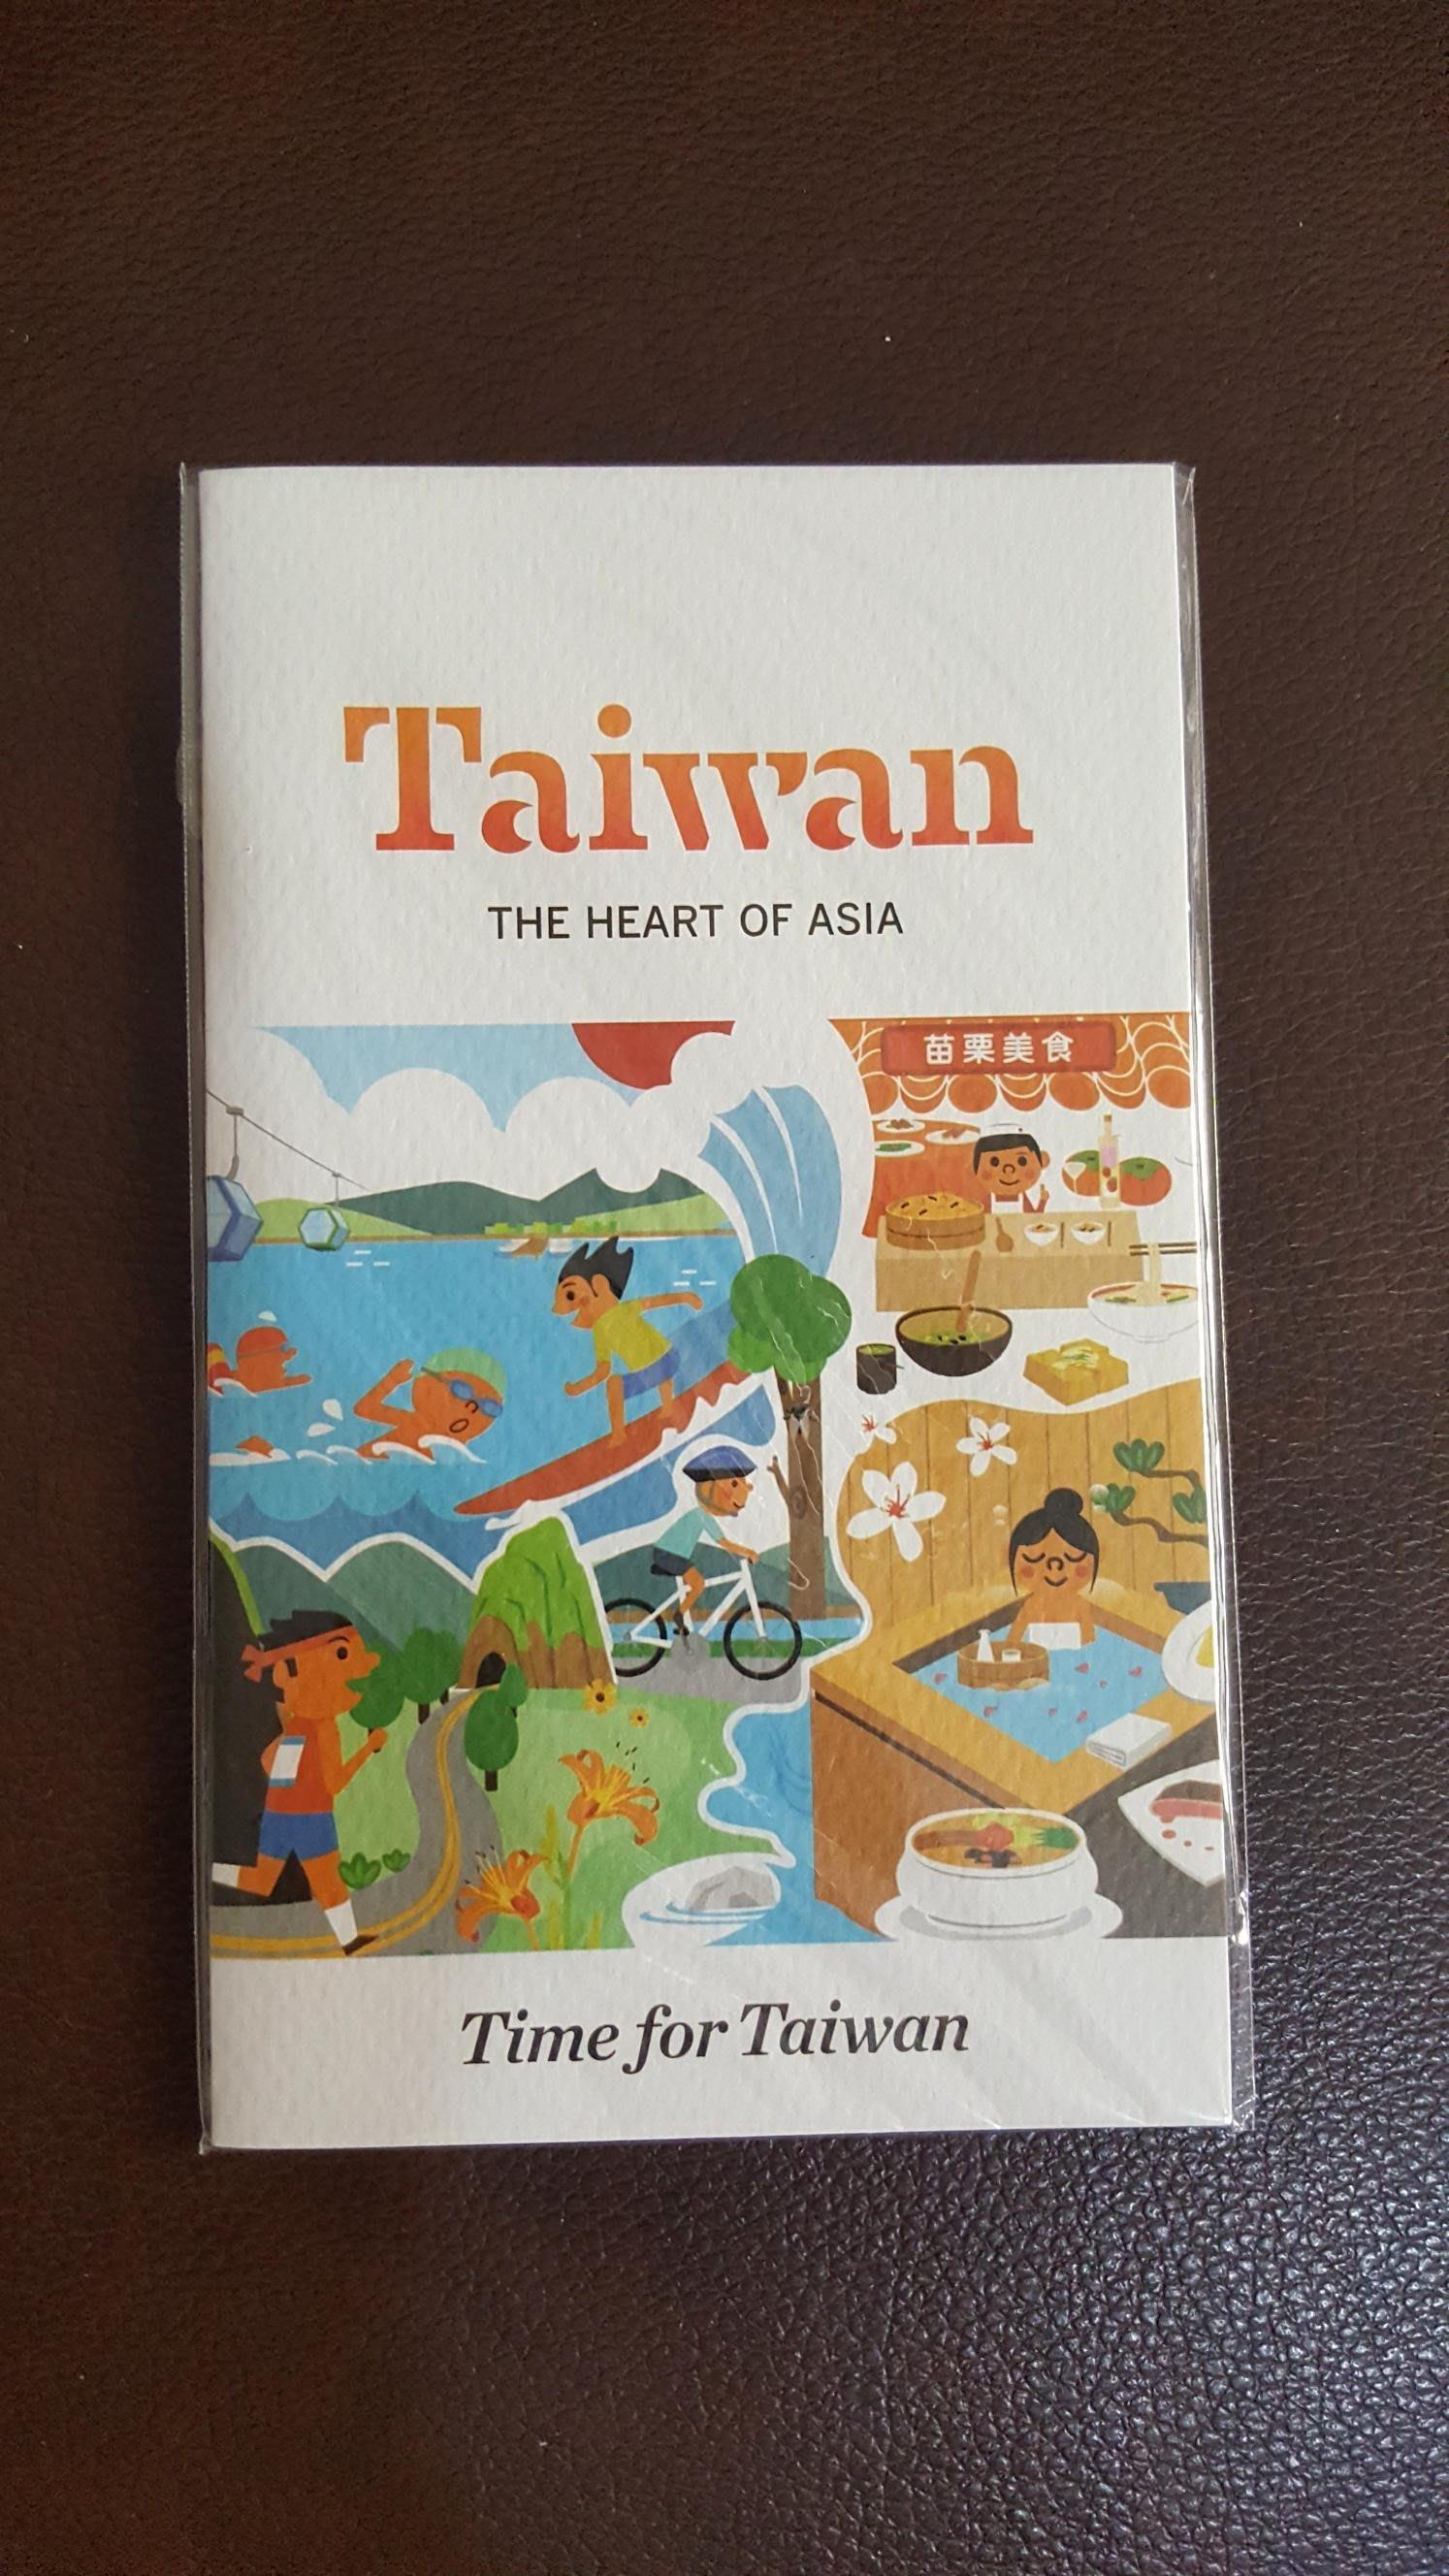 S8 交通部觀光局紀念悠遊卡 限量版 旅行台灣 就是現在  現貨